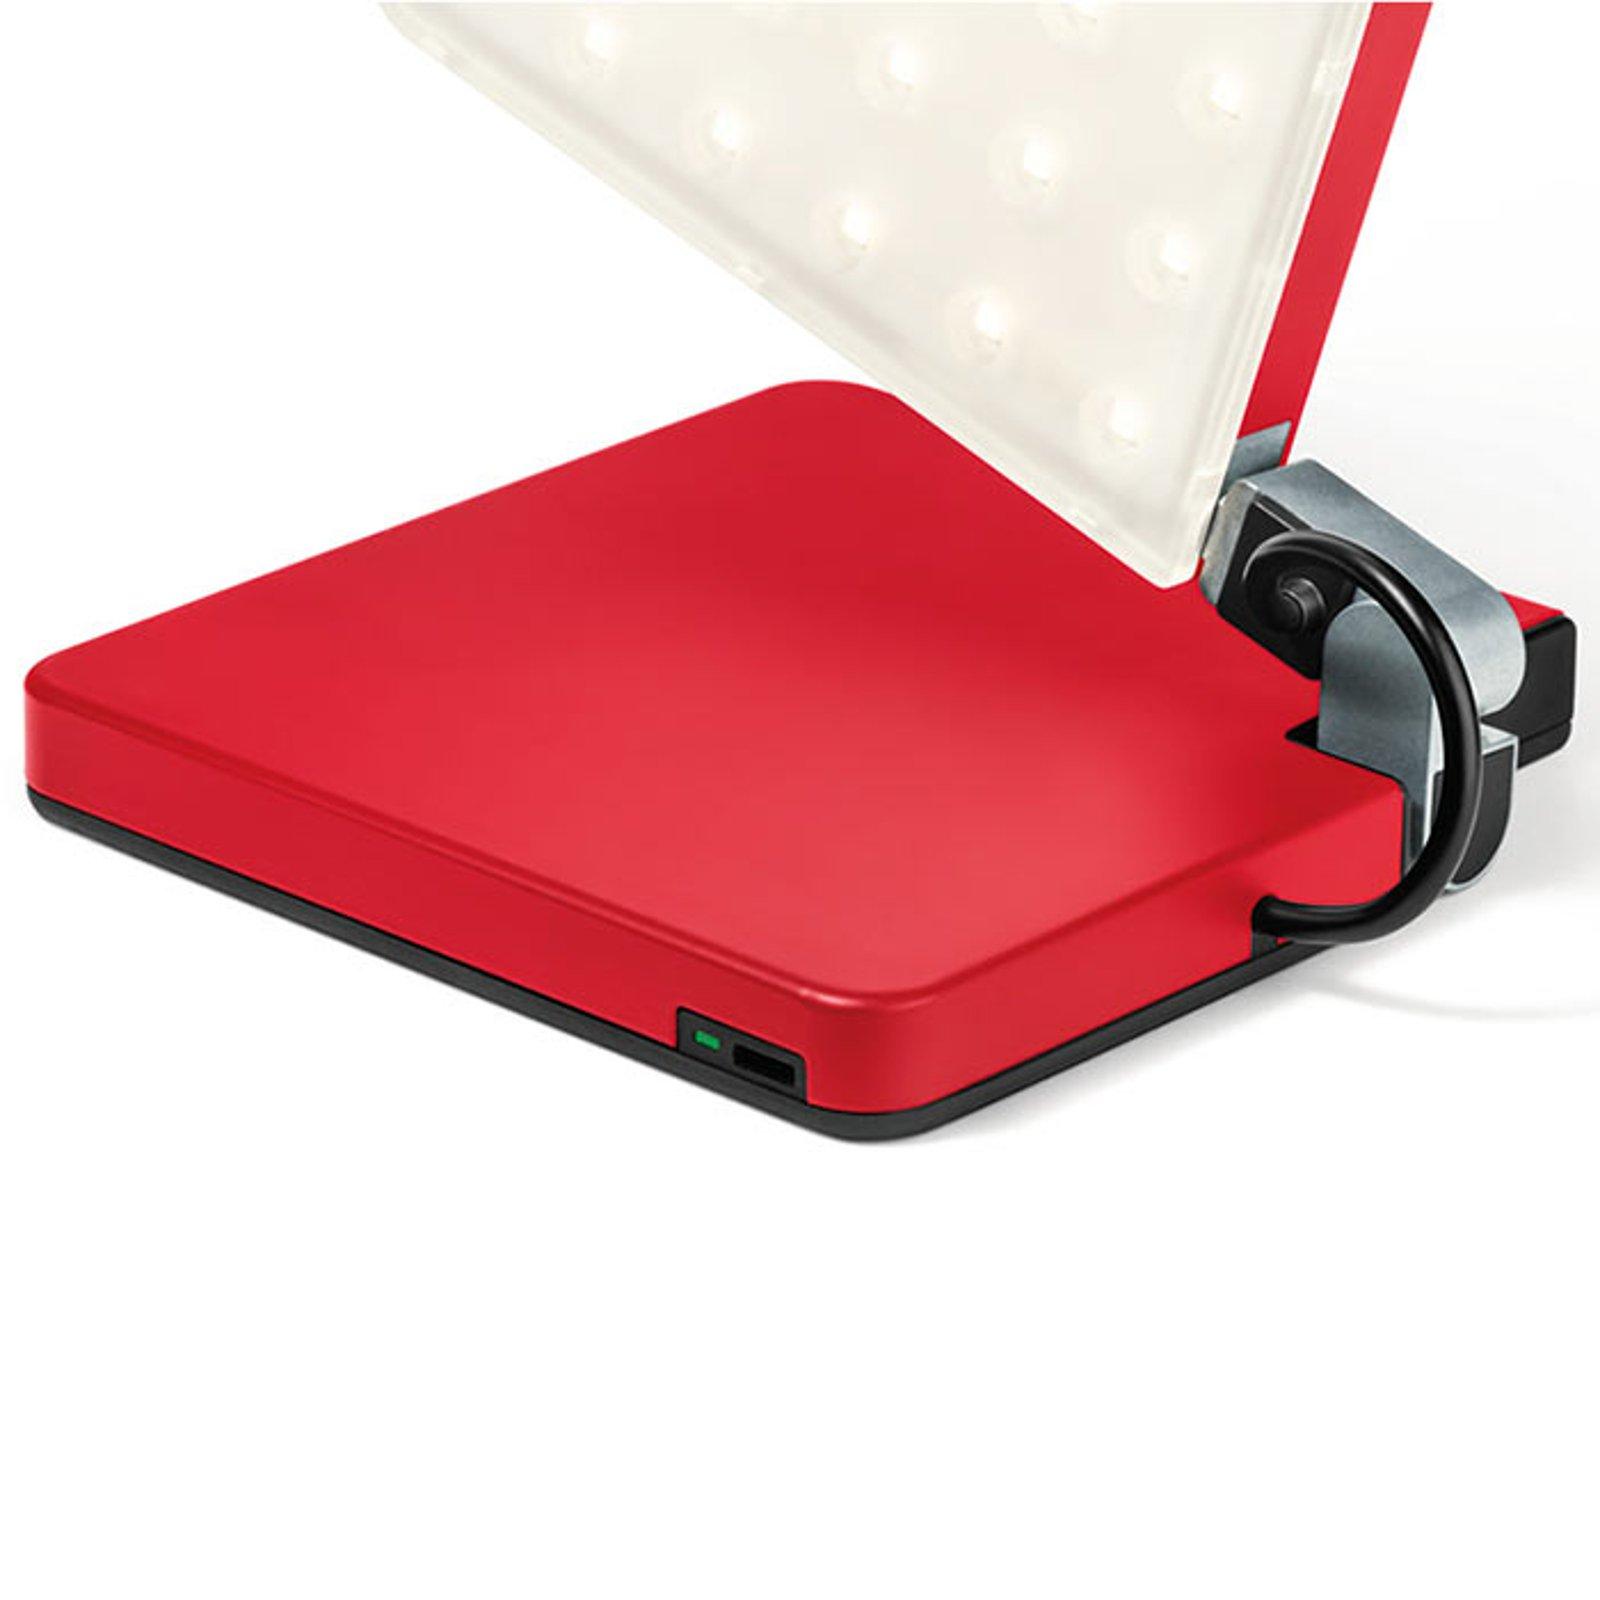 Nimbus Roxxane Fly LED-bordlampe, rød